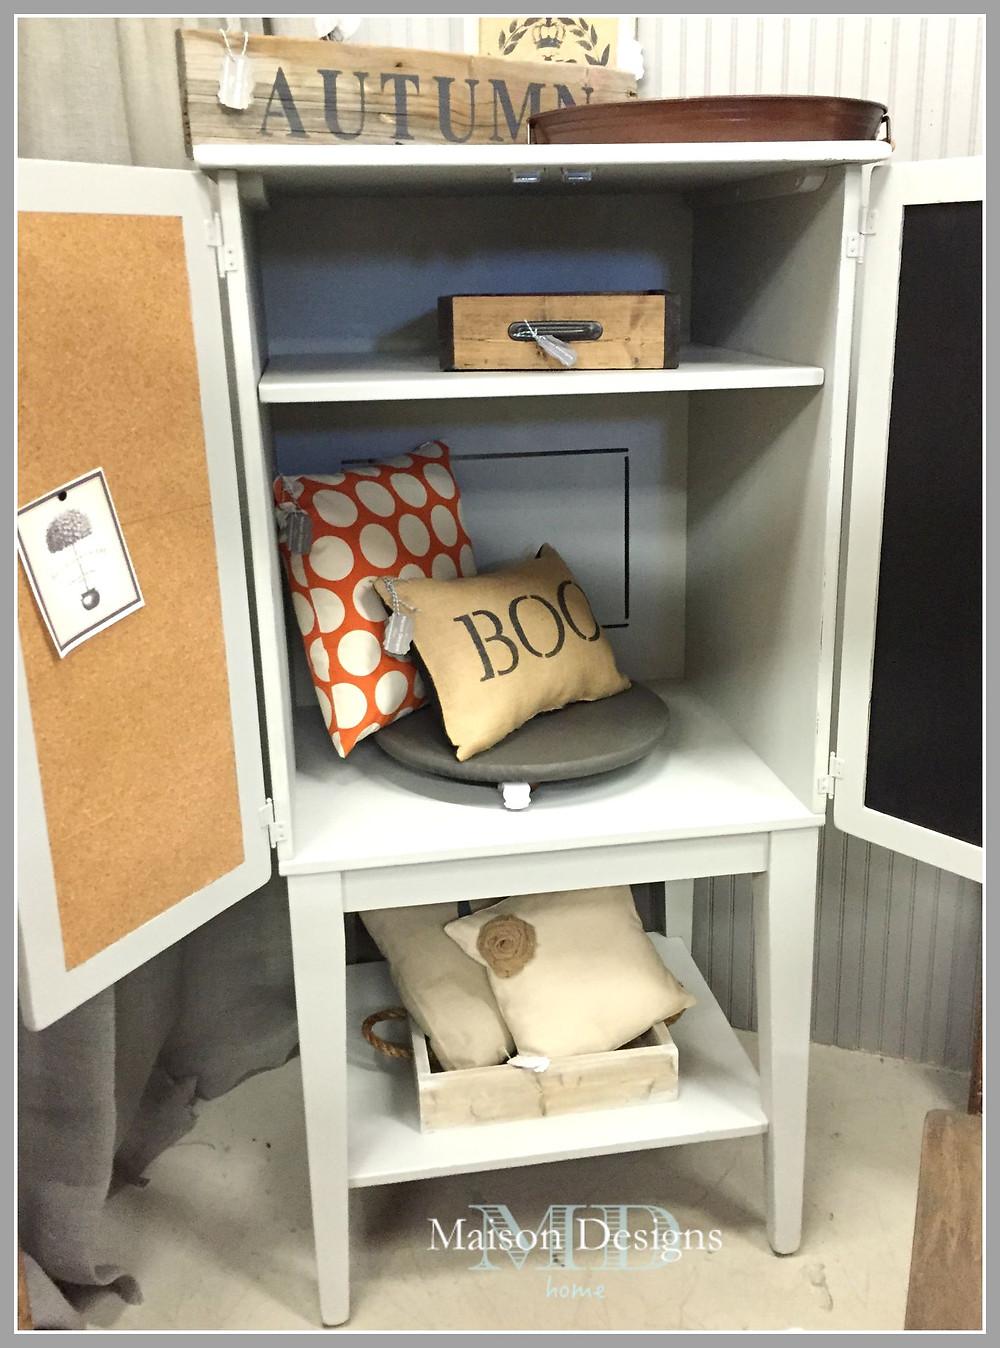 Furniture Makeover Media Cabinet-Maison Designs Home